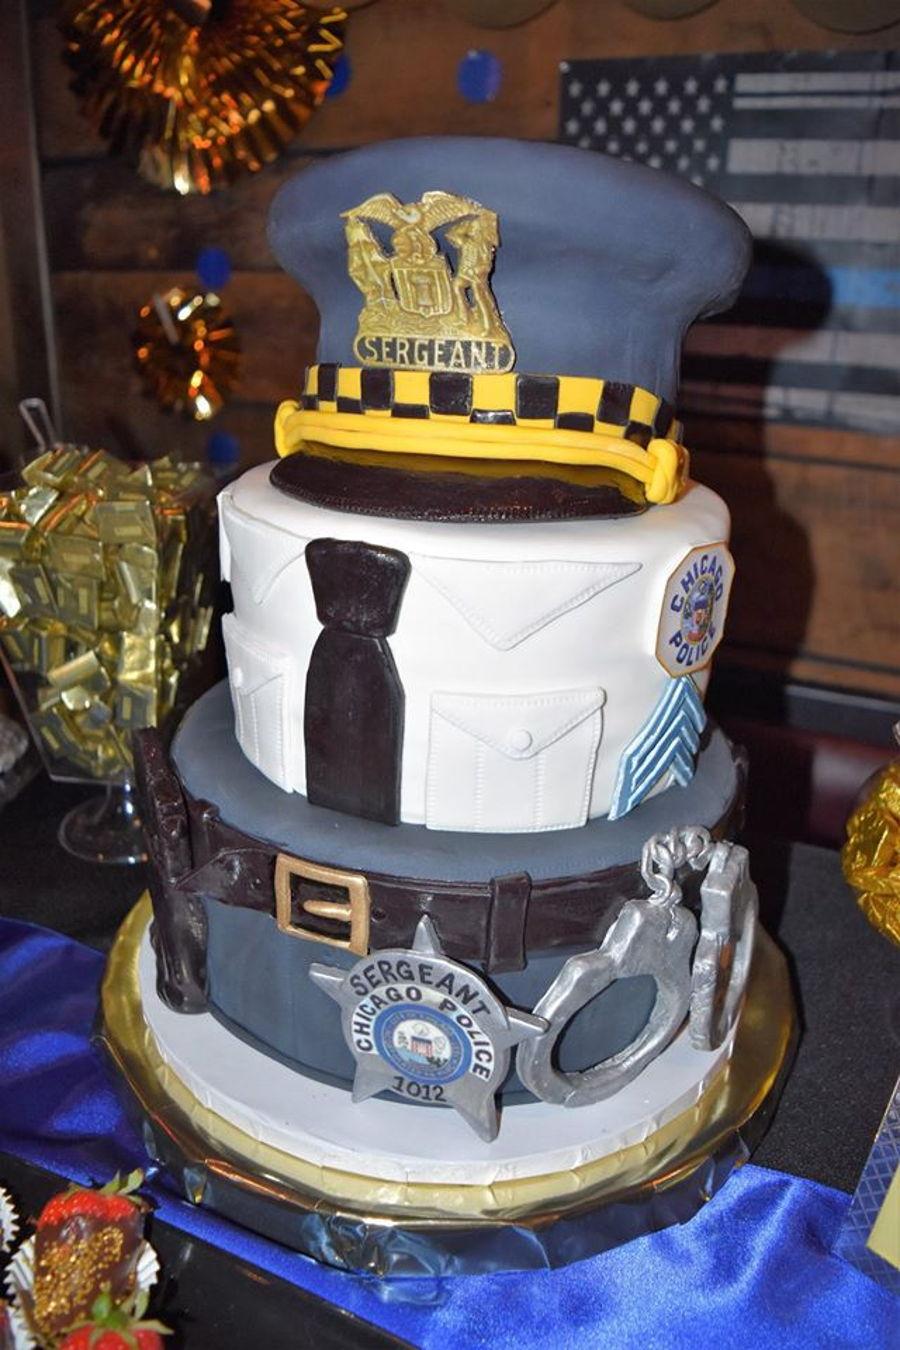 Chicago Police Sergeant Promotional Cake Cakecentral Com